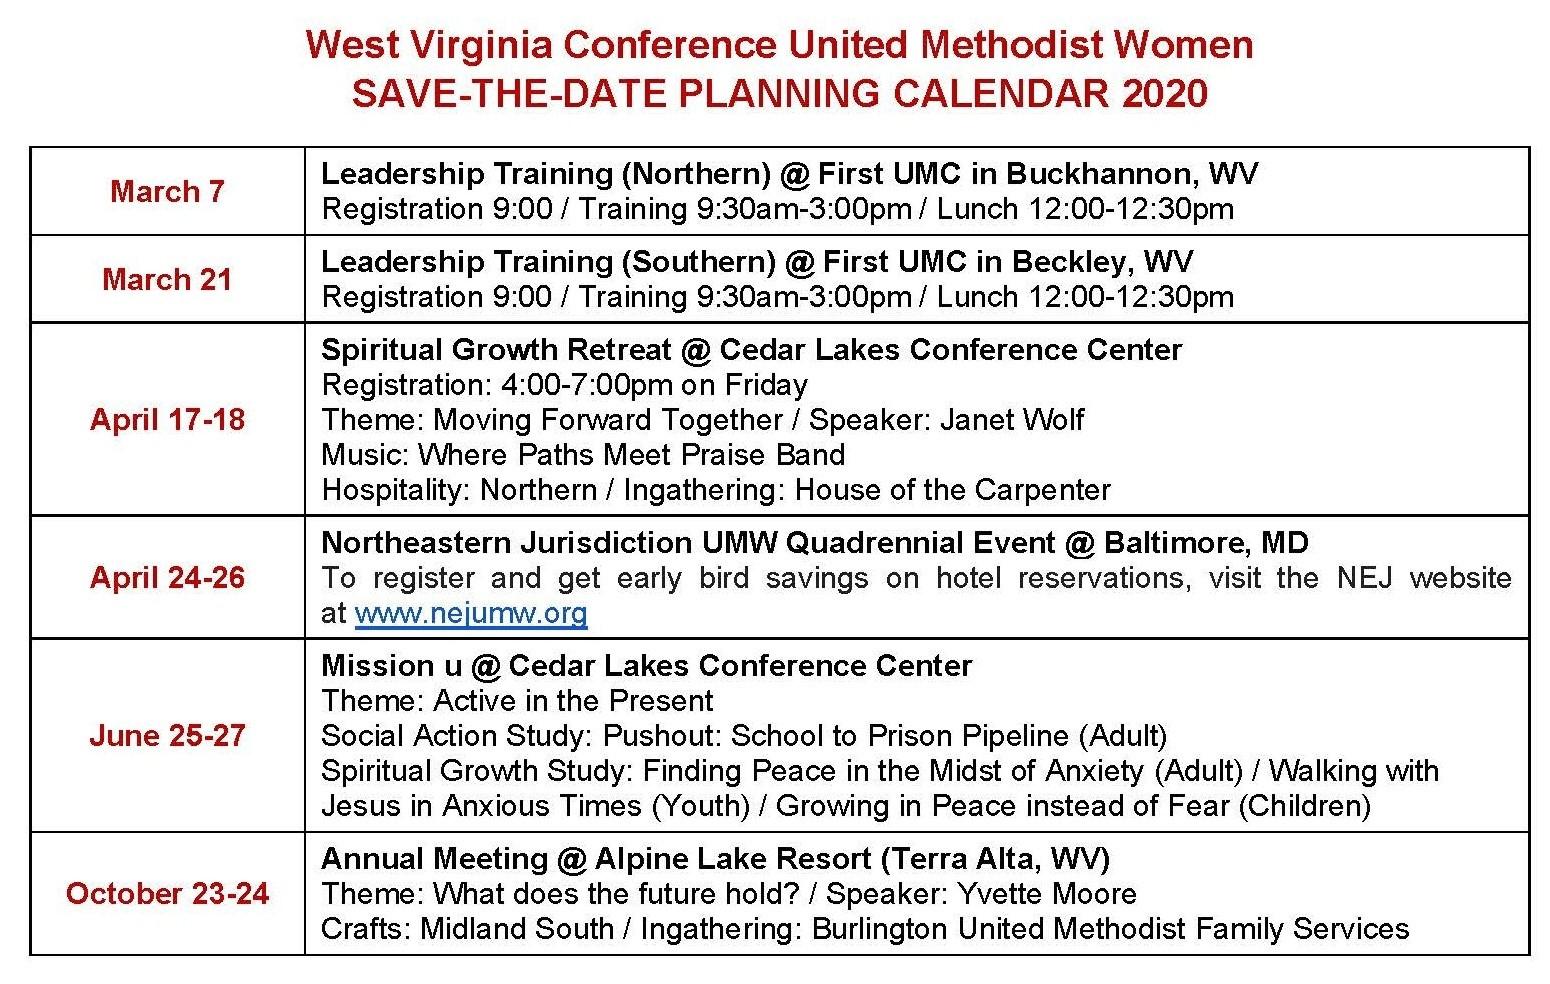 Downloadable Umc Liturgical Calendar 2020 - Calendar  Methodist Church Lectionary